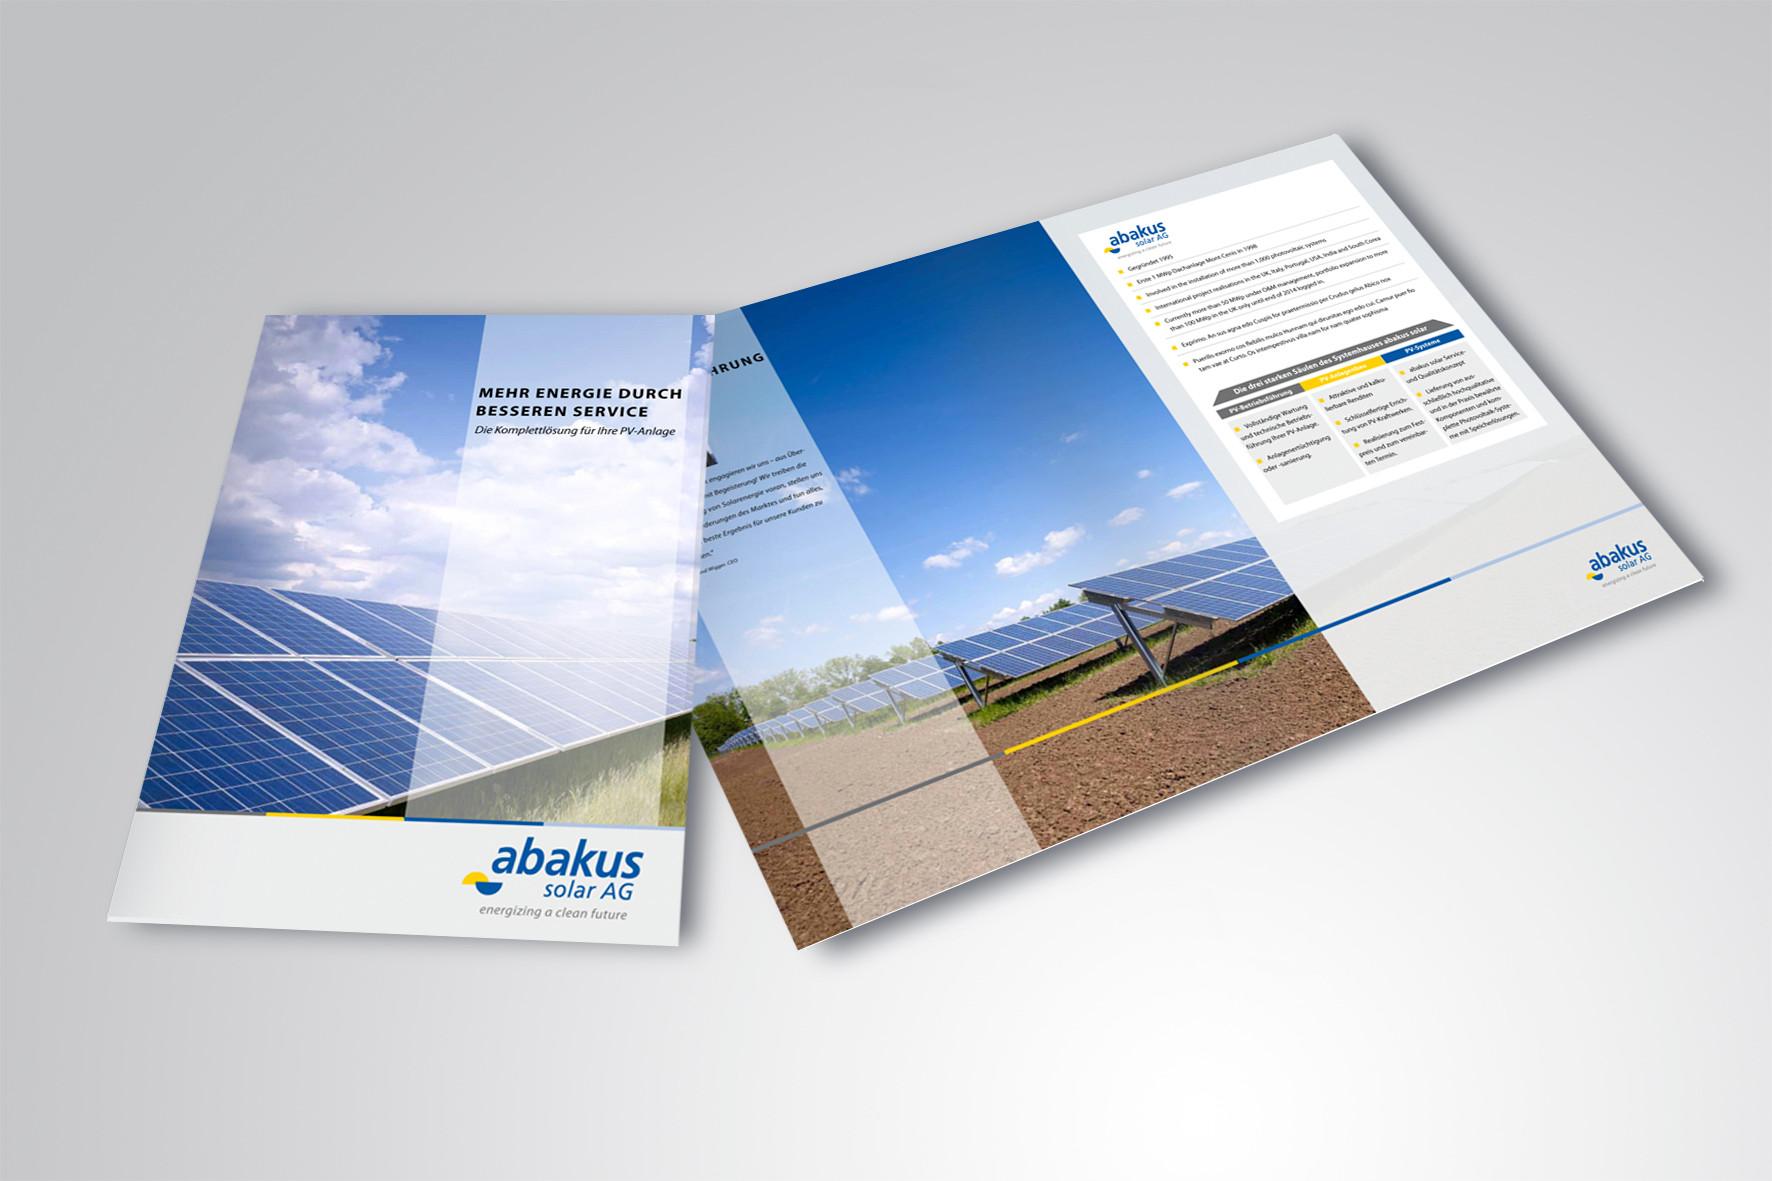 Kunde: abakus solar AG · Produkt: O&M Broschüre